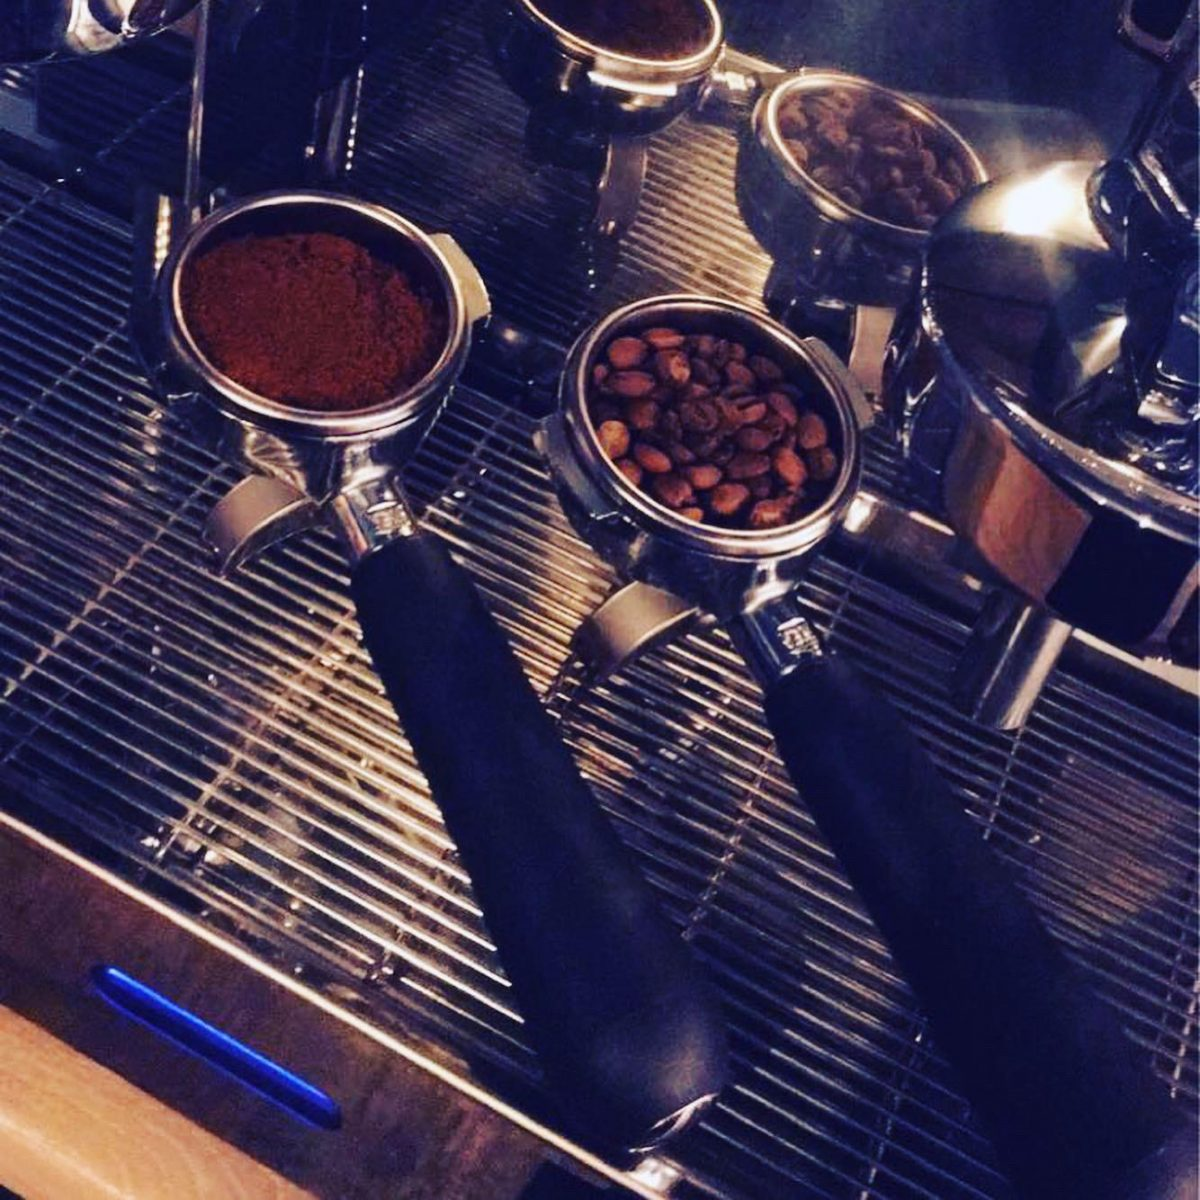 la cafei sibiu 11